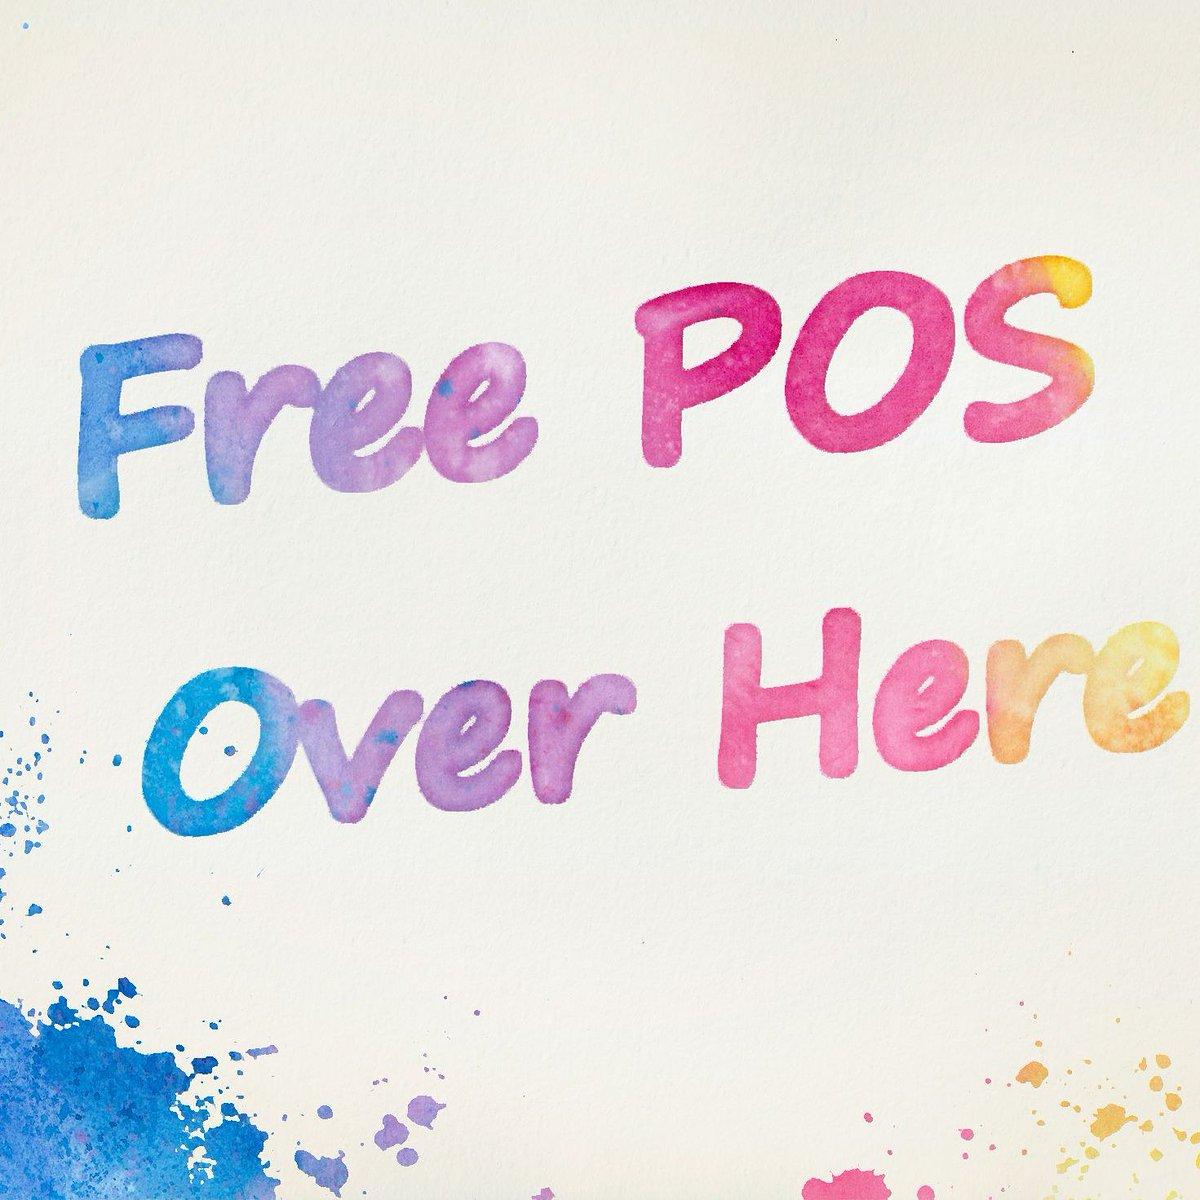 freepossystem hashtag on Twitter